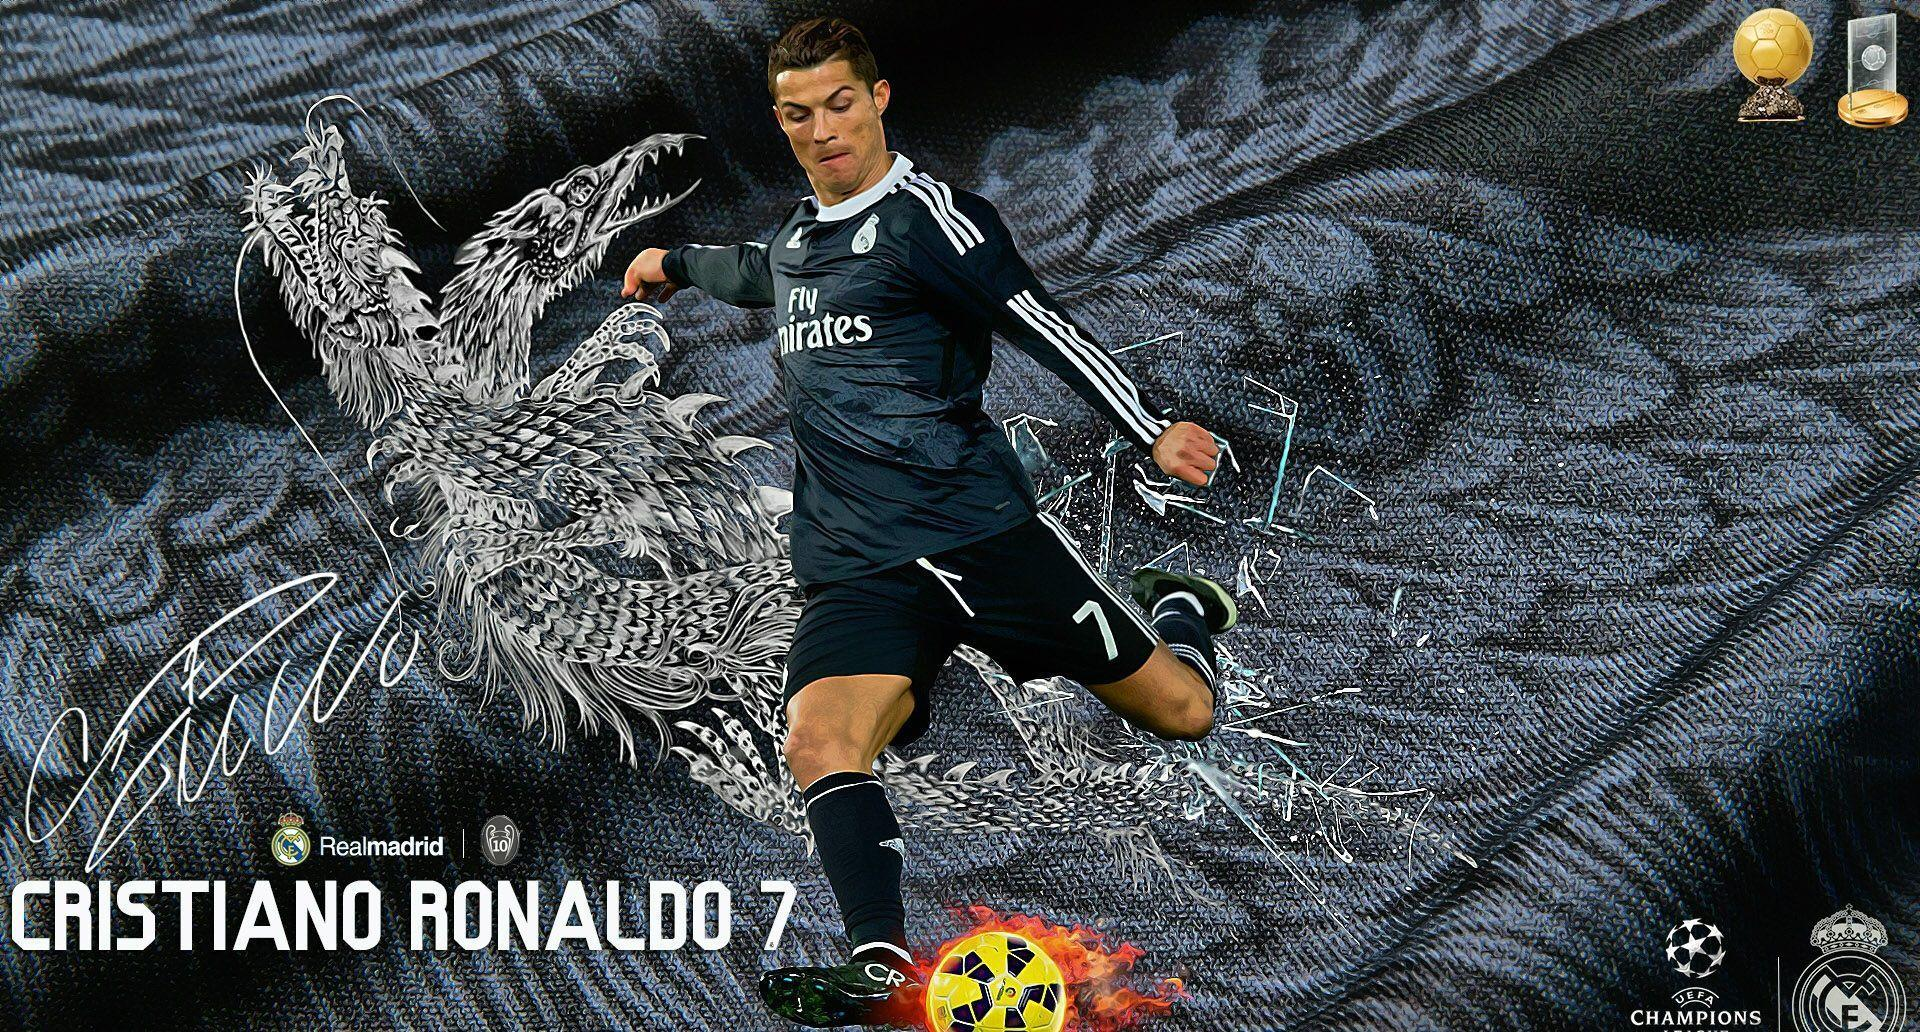 Ronaldo Real Madrid Wallpaper